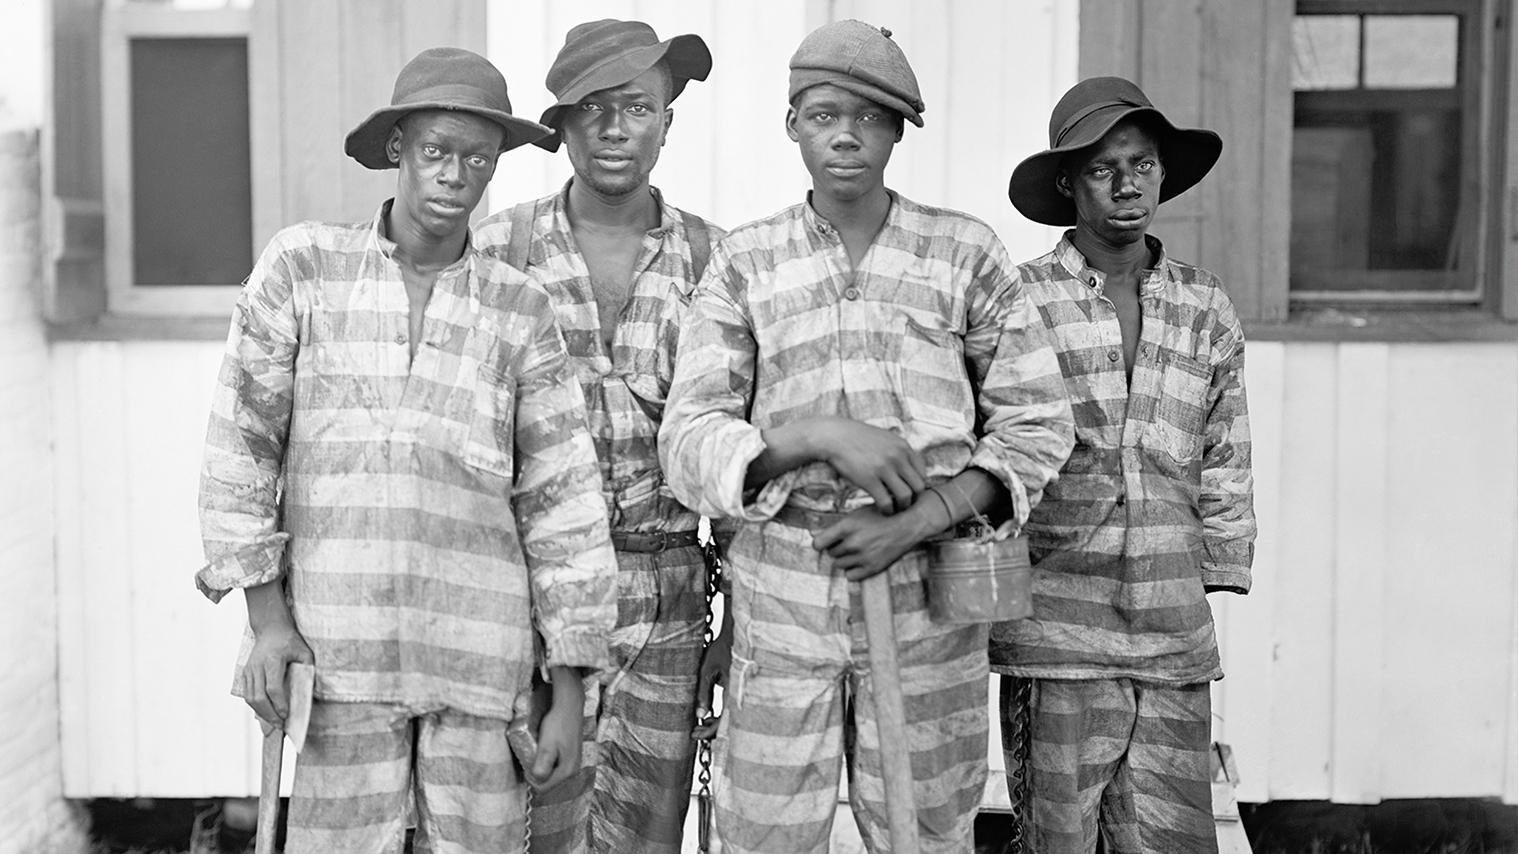 Four men standing in prison uniforms